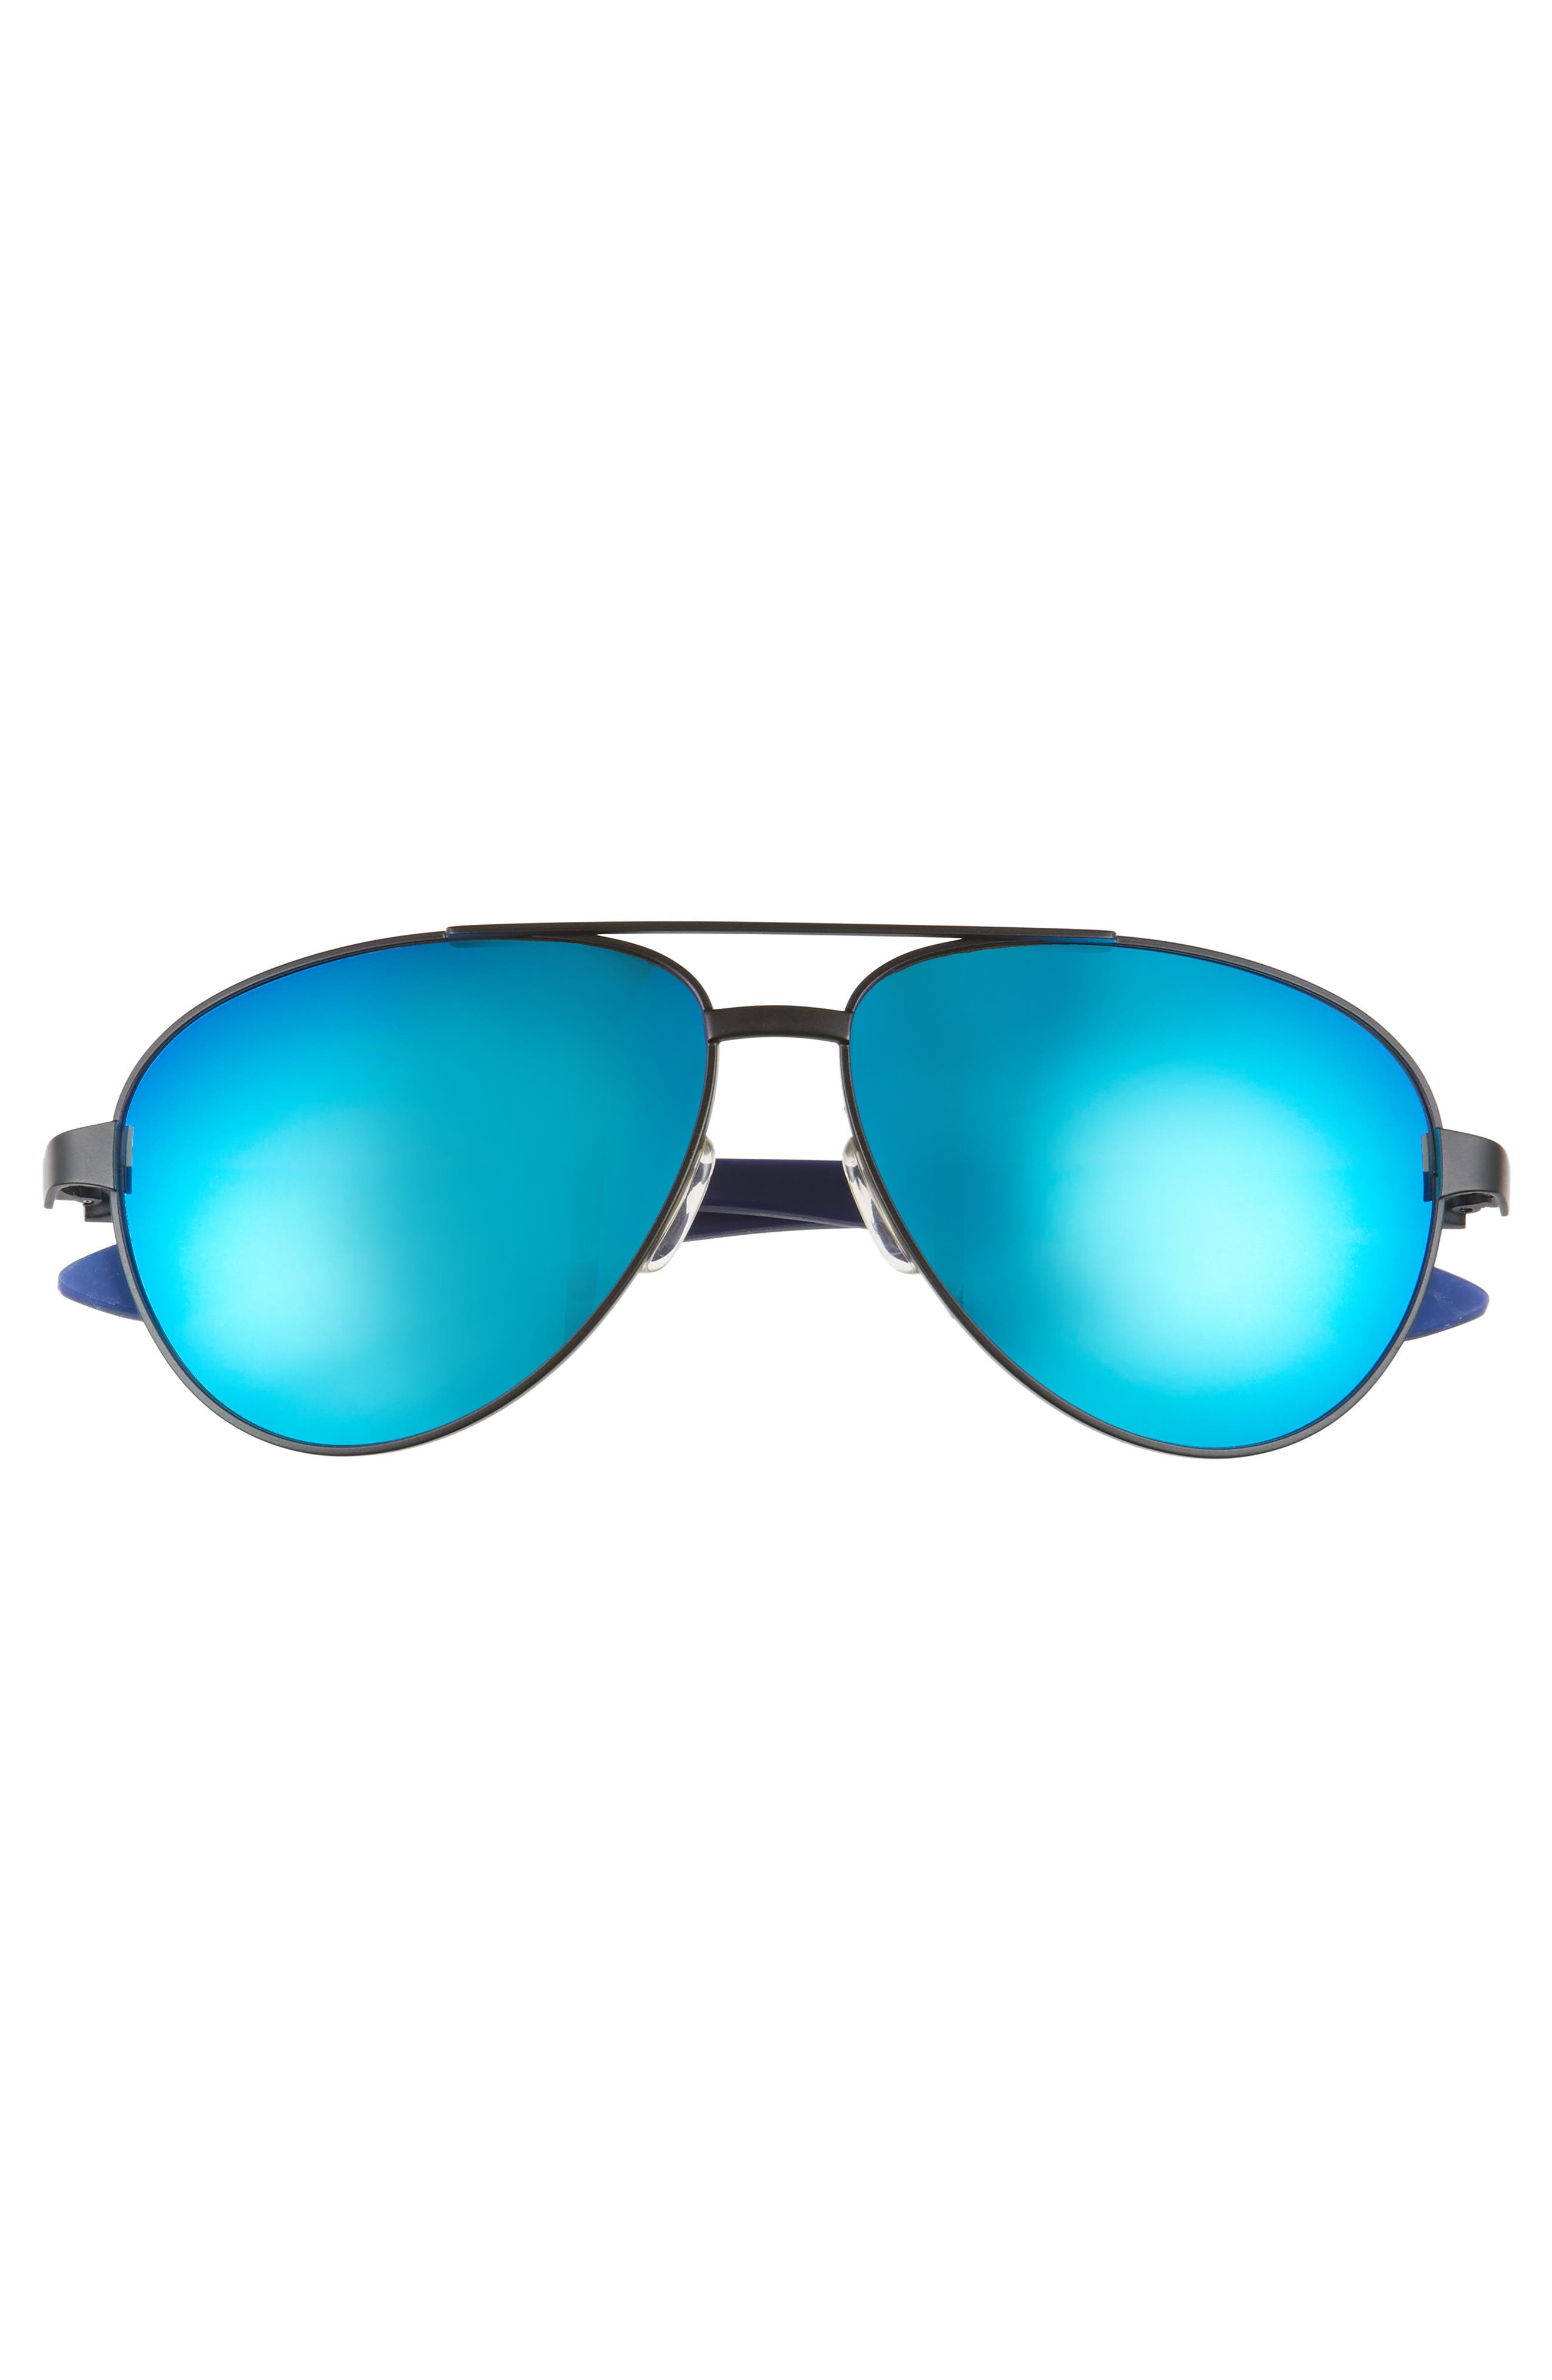 Salute 59mm Aviator Sunglasses,                             Alternate thumbnail 3, color,                             Matte Black